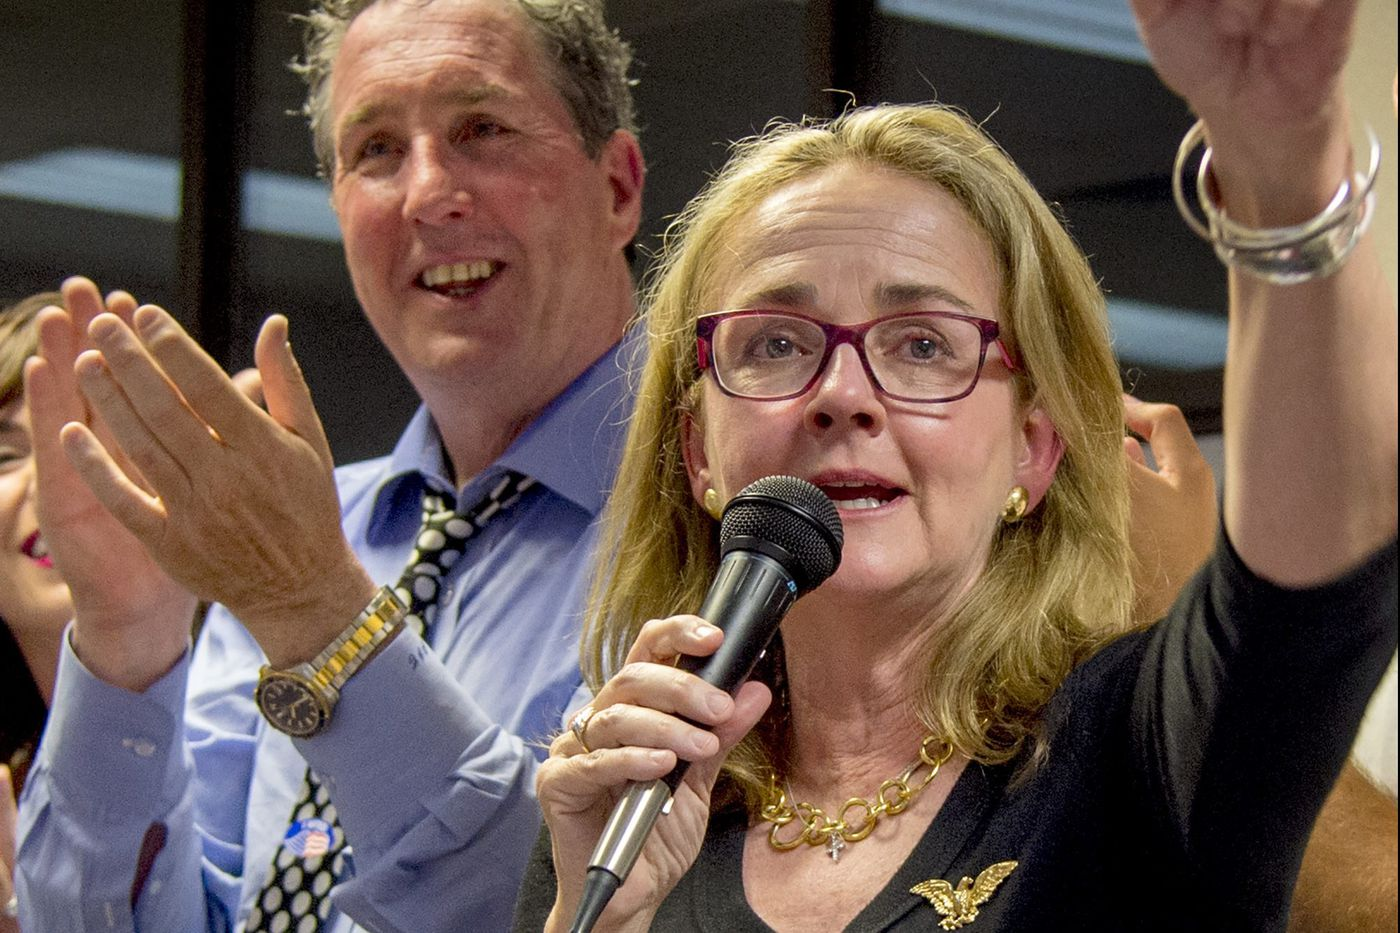 Democrat Madeleine Dean to amend financial report in Montco Congress race